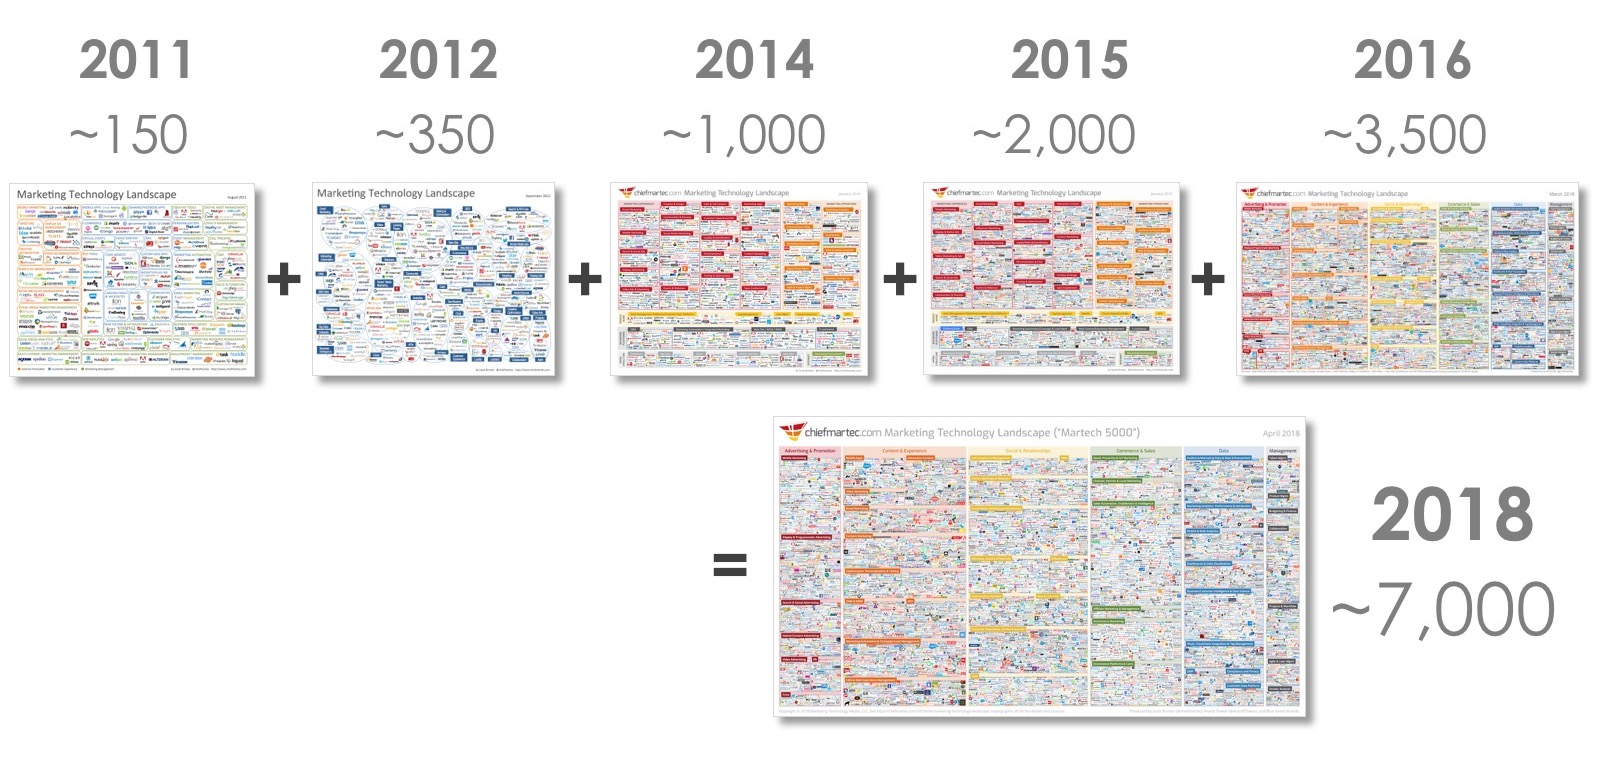 personalization trends martech 5000